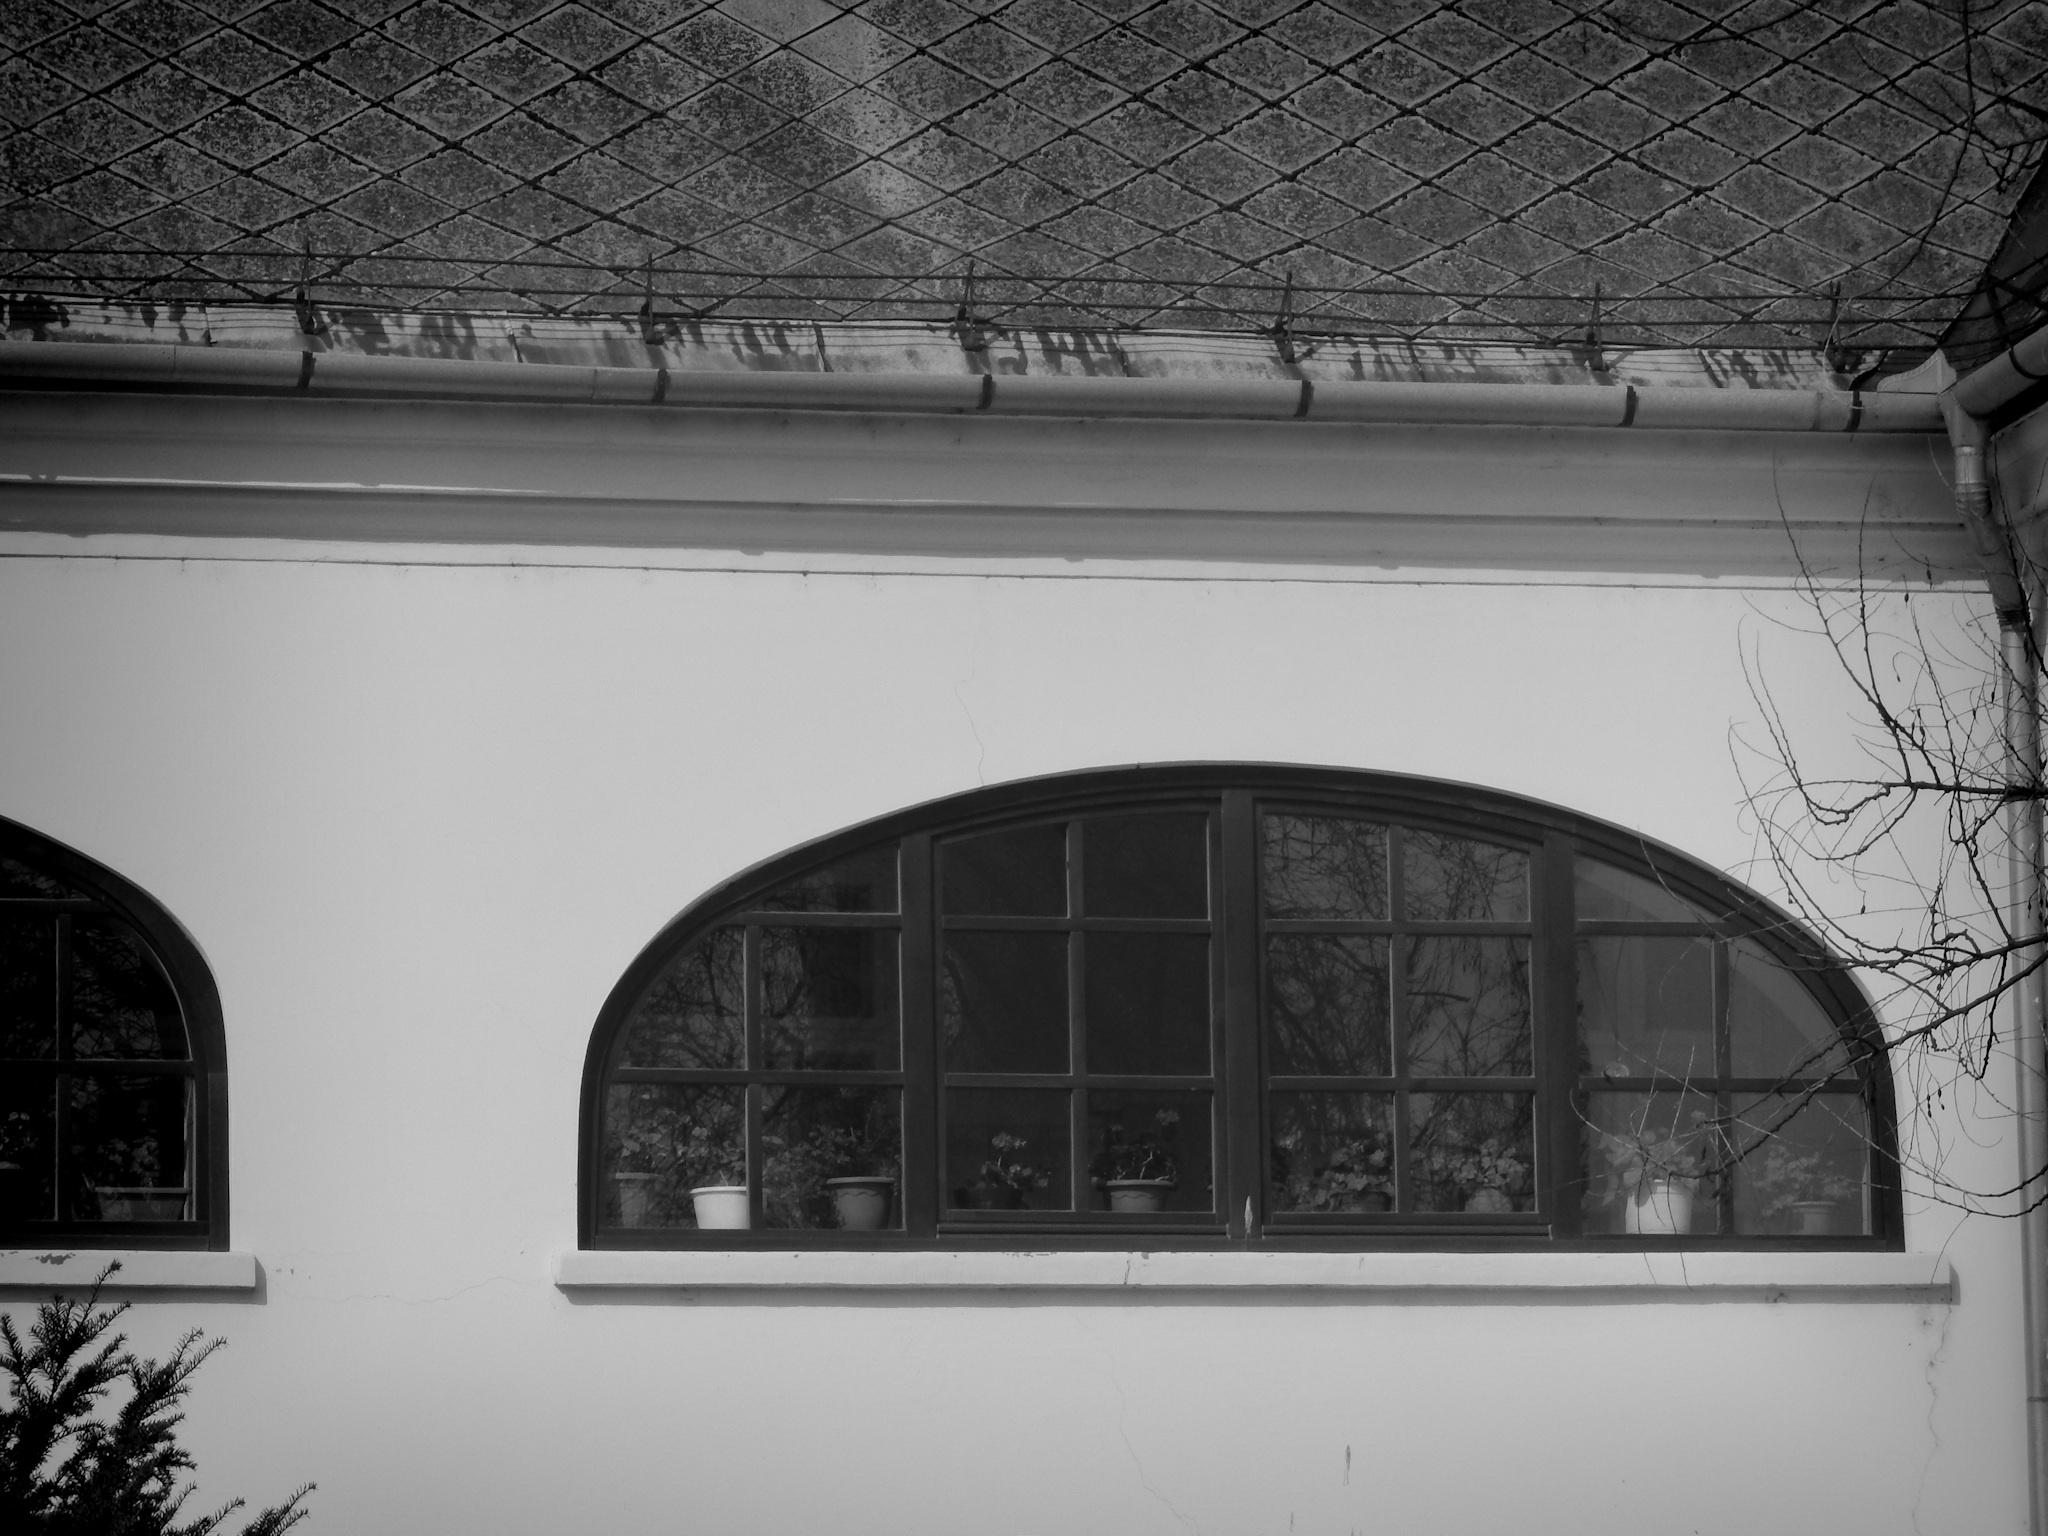 Old school by Balazs Kosaras